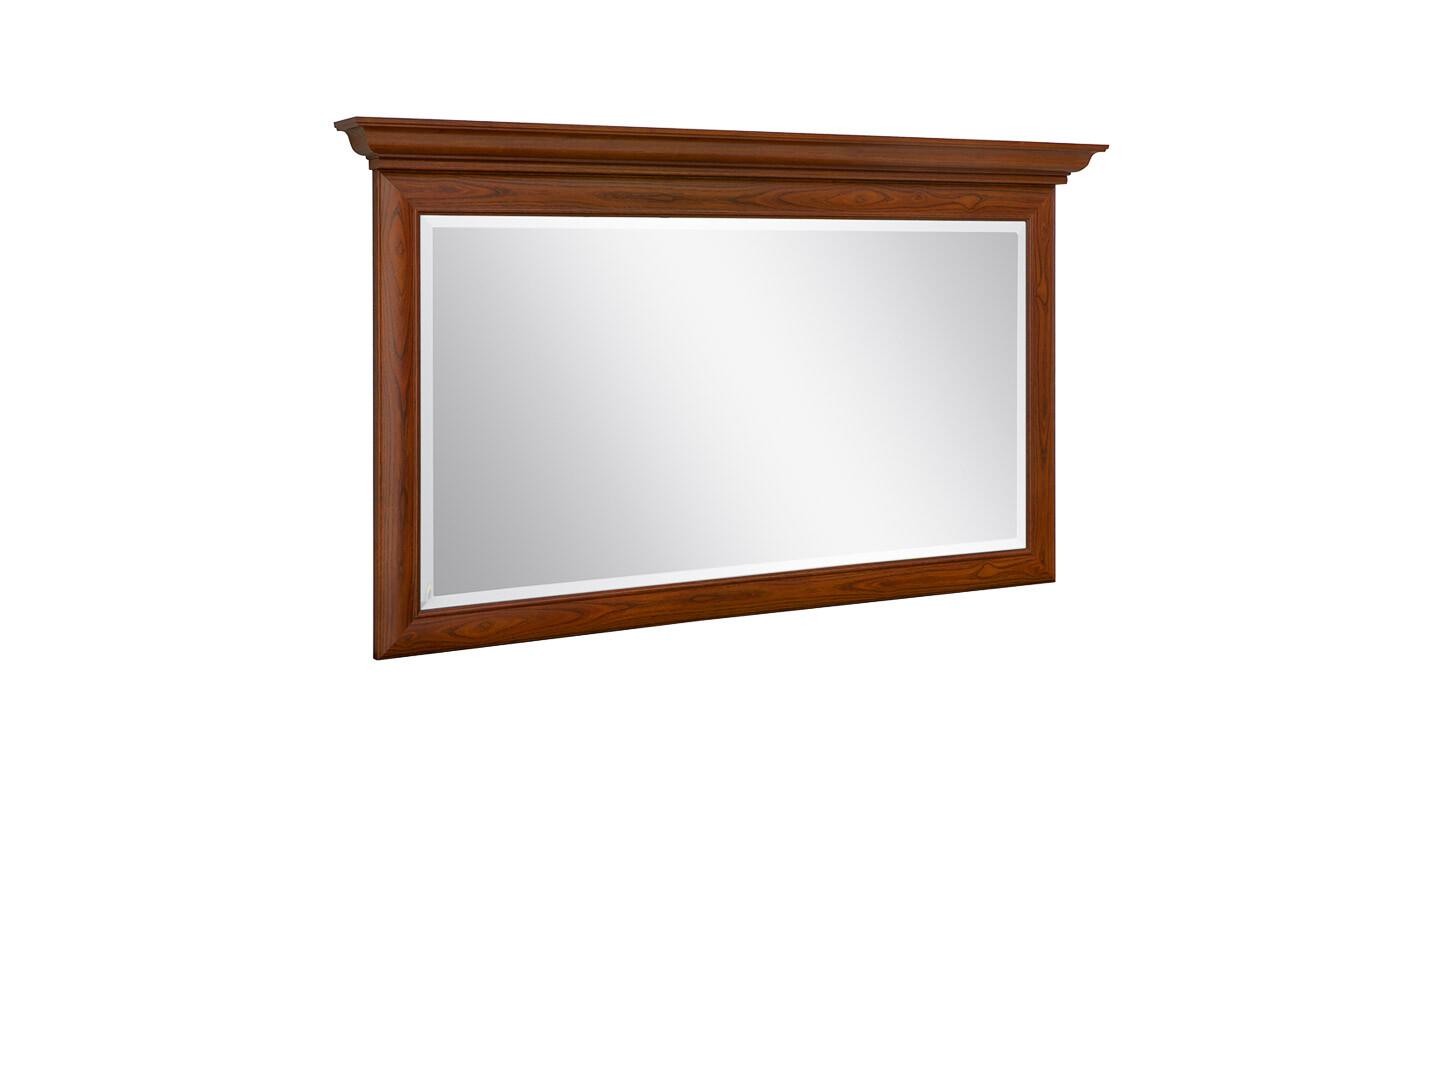 Zrkadlo KENT ELUS 155 gaštan